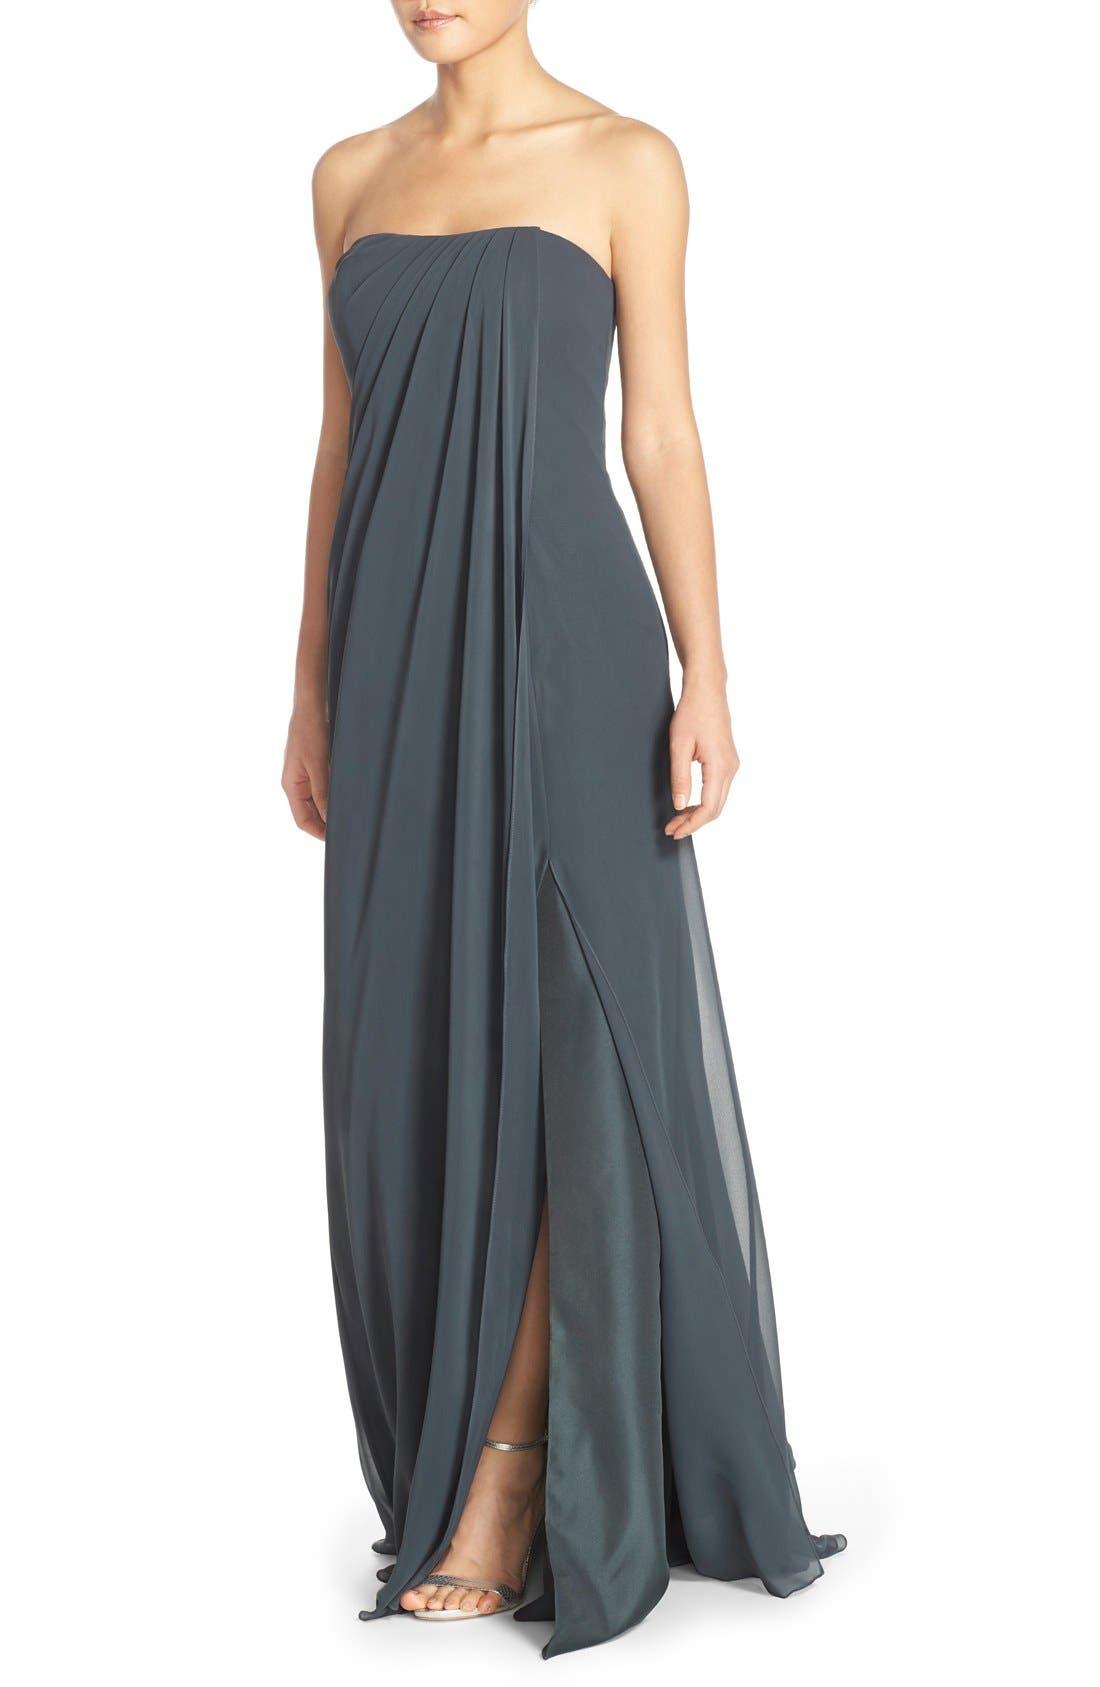 Raquel Front Slit Strapless Chiffon Gown,                             Alternate thumbnail 4, color,                             026